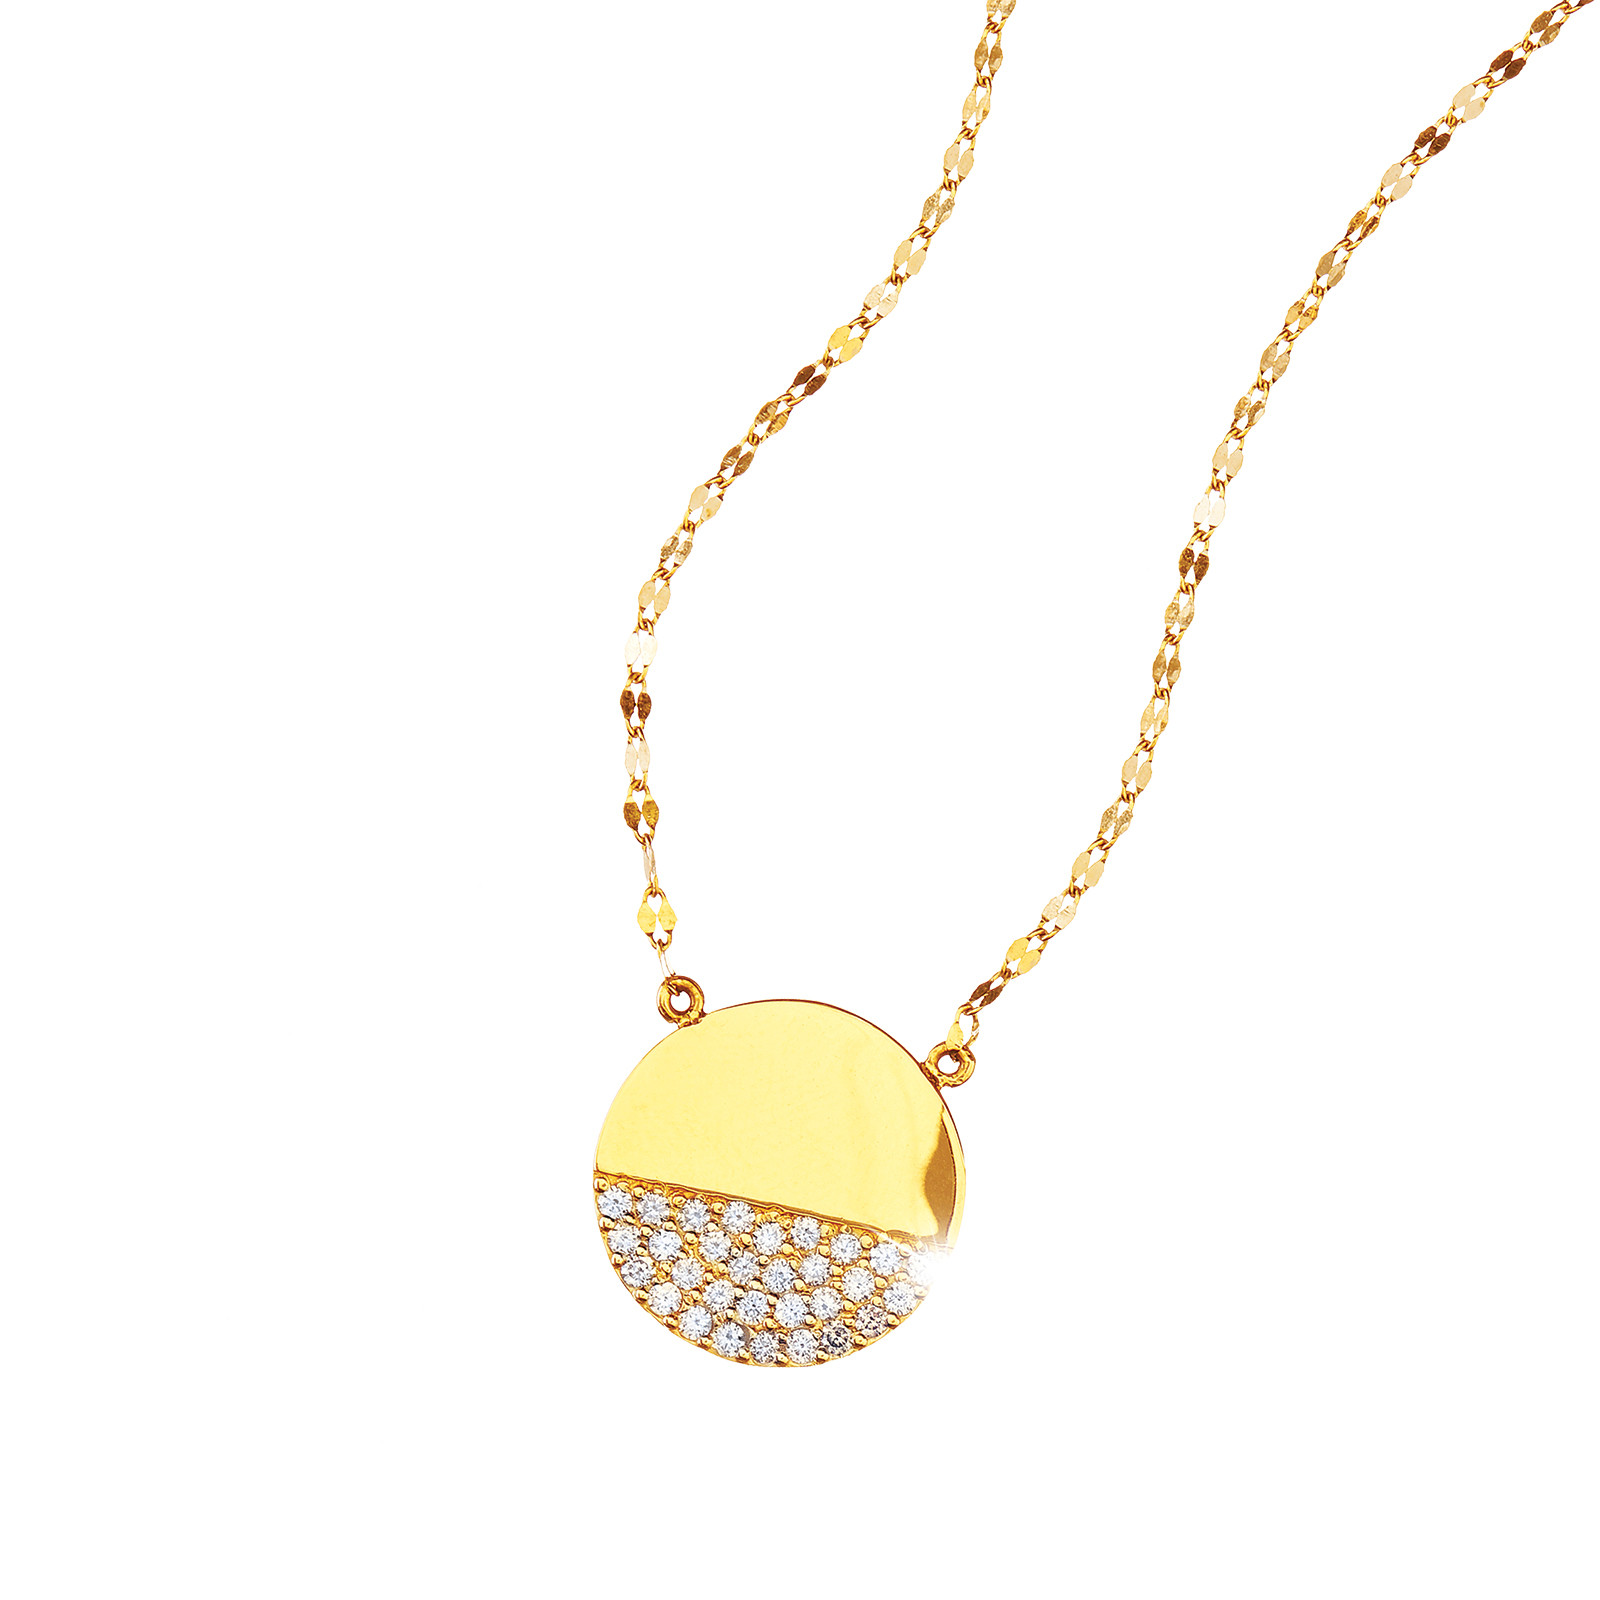 New Lana Jewelry 0.40 CTW Diamond Illusion Disc Necklace